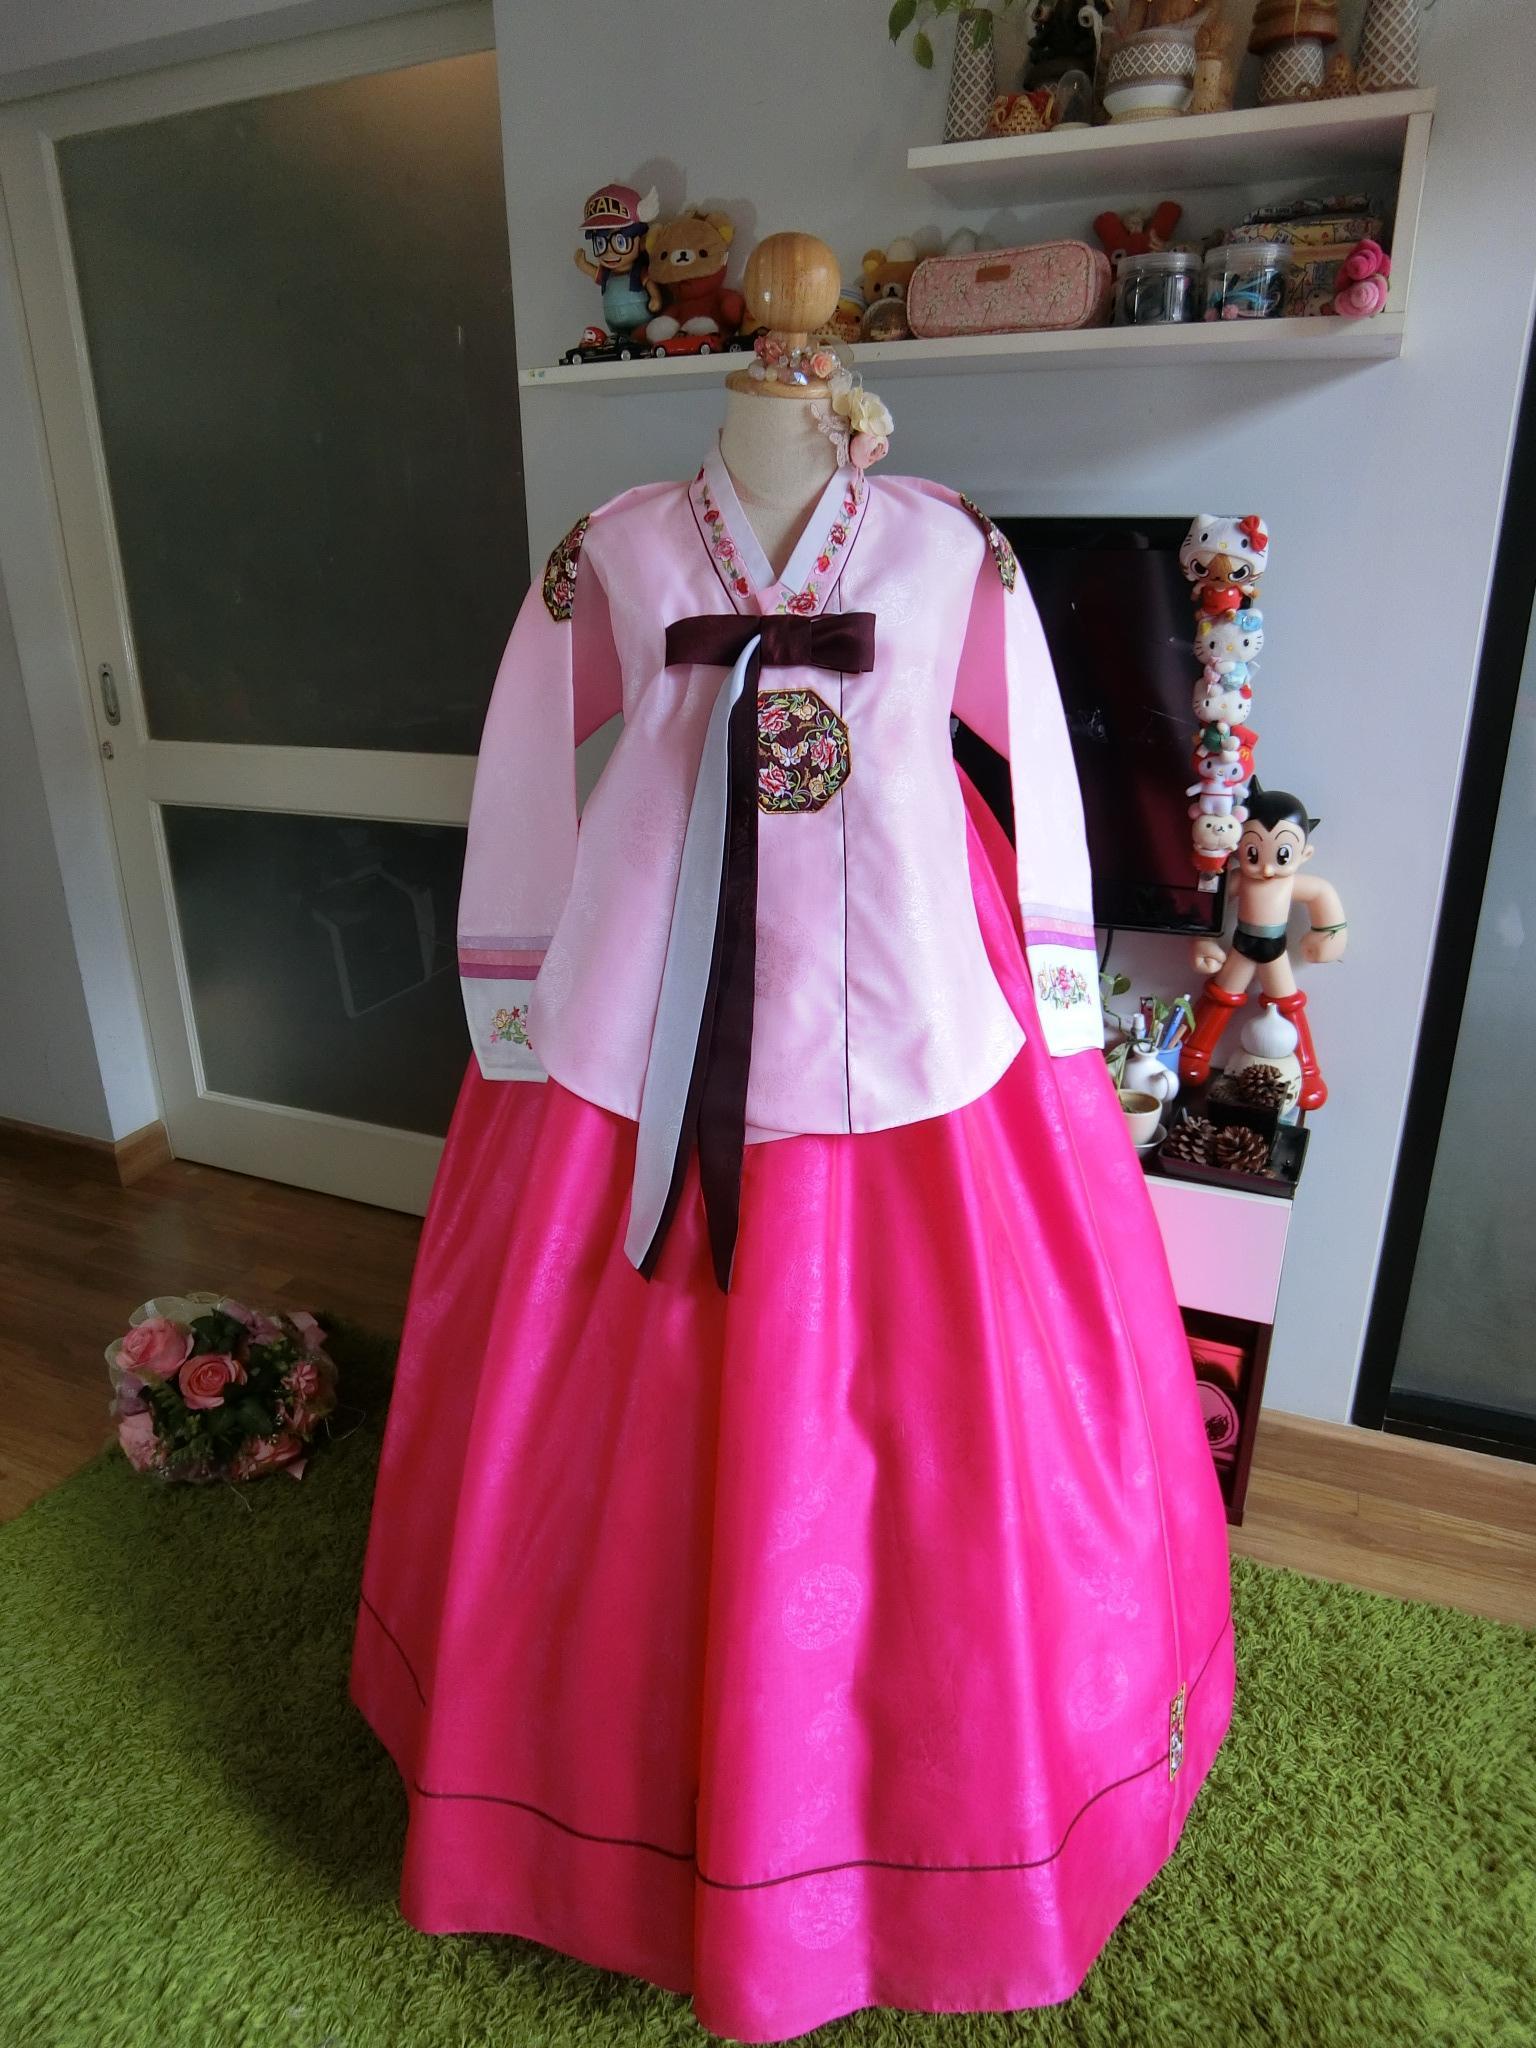 "Hanbok เด็ก 13 ขวบ ชาววังพรีเมี่ยม อก 37"" สูง 145"